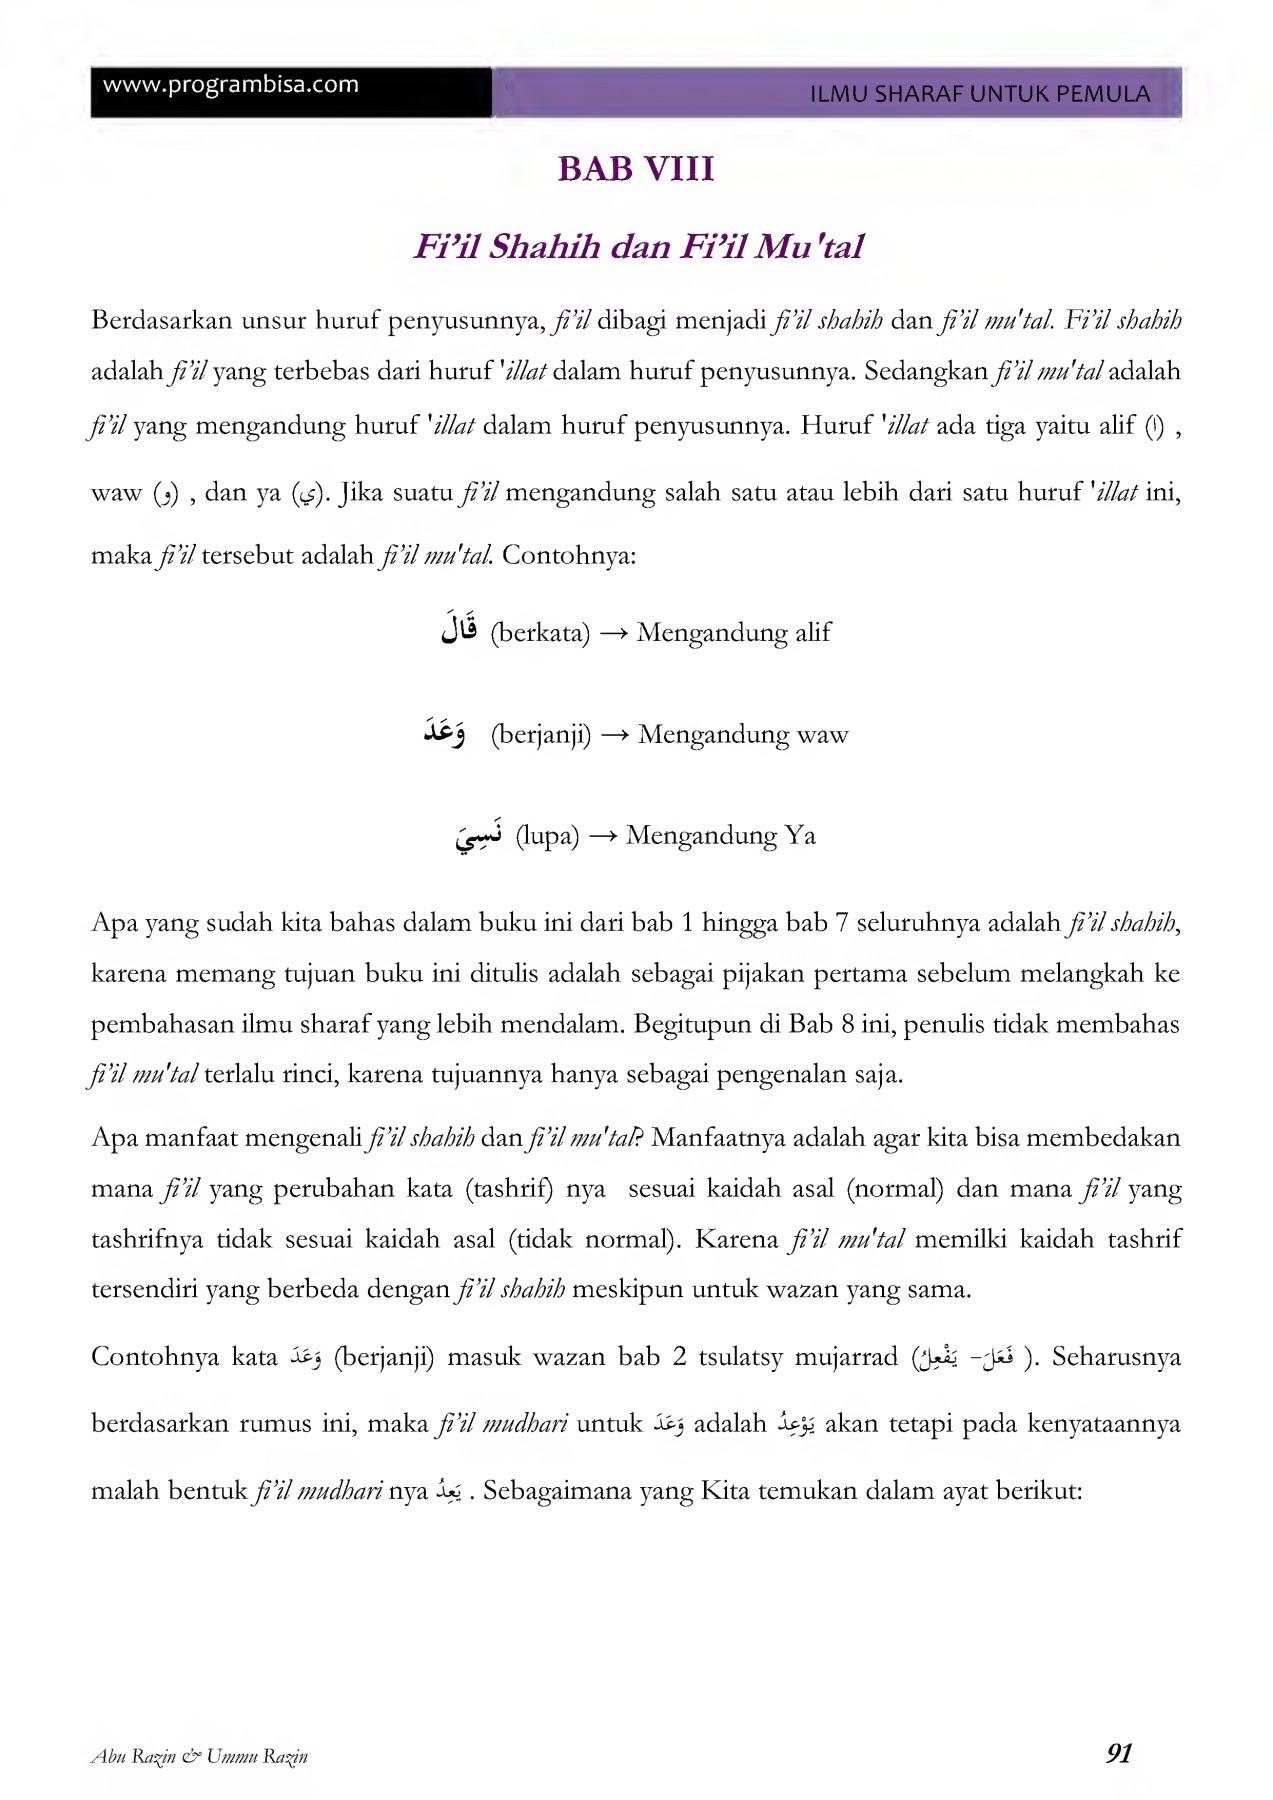 Ebook Ilmu Sharaf Untuk Pemula Cetakan 2 Rev 02 Pages 101 150 Text Version